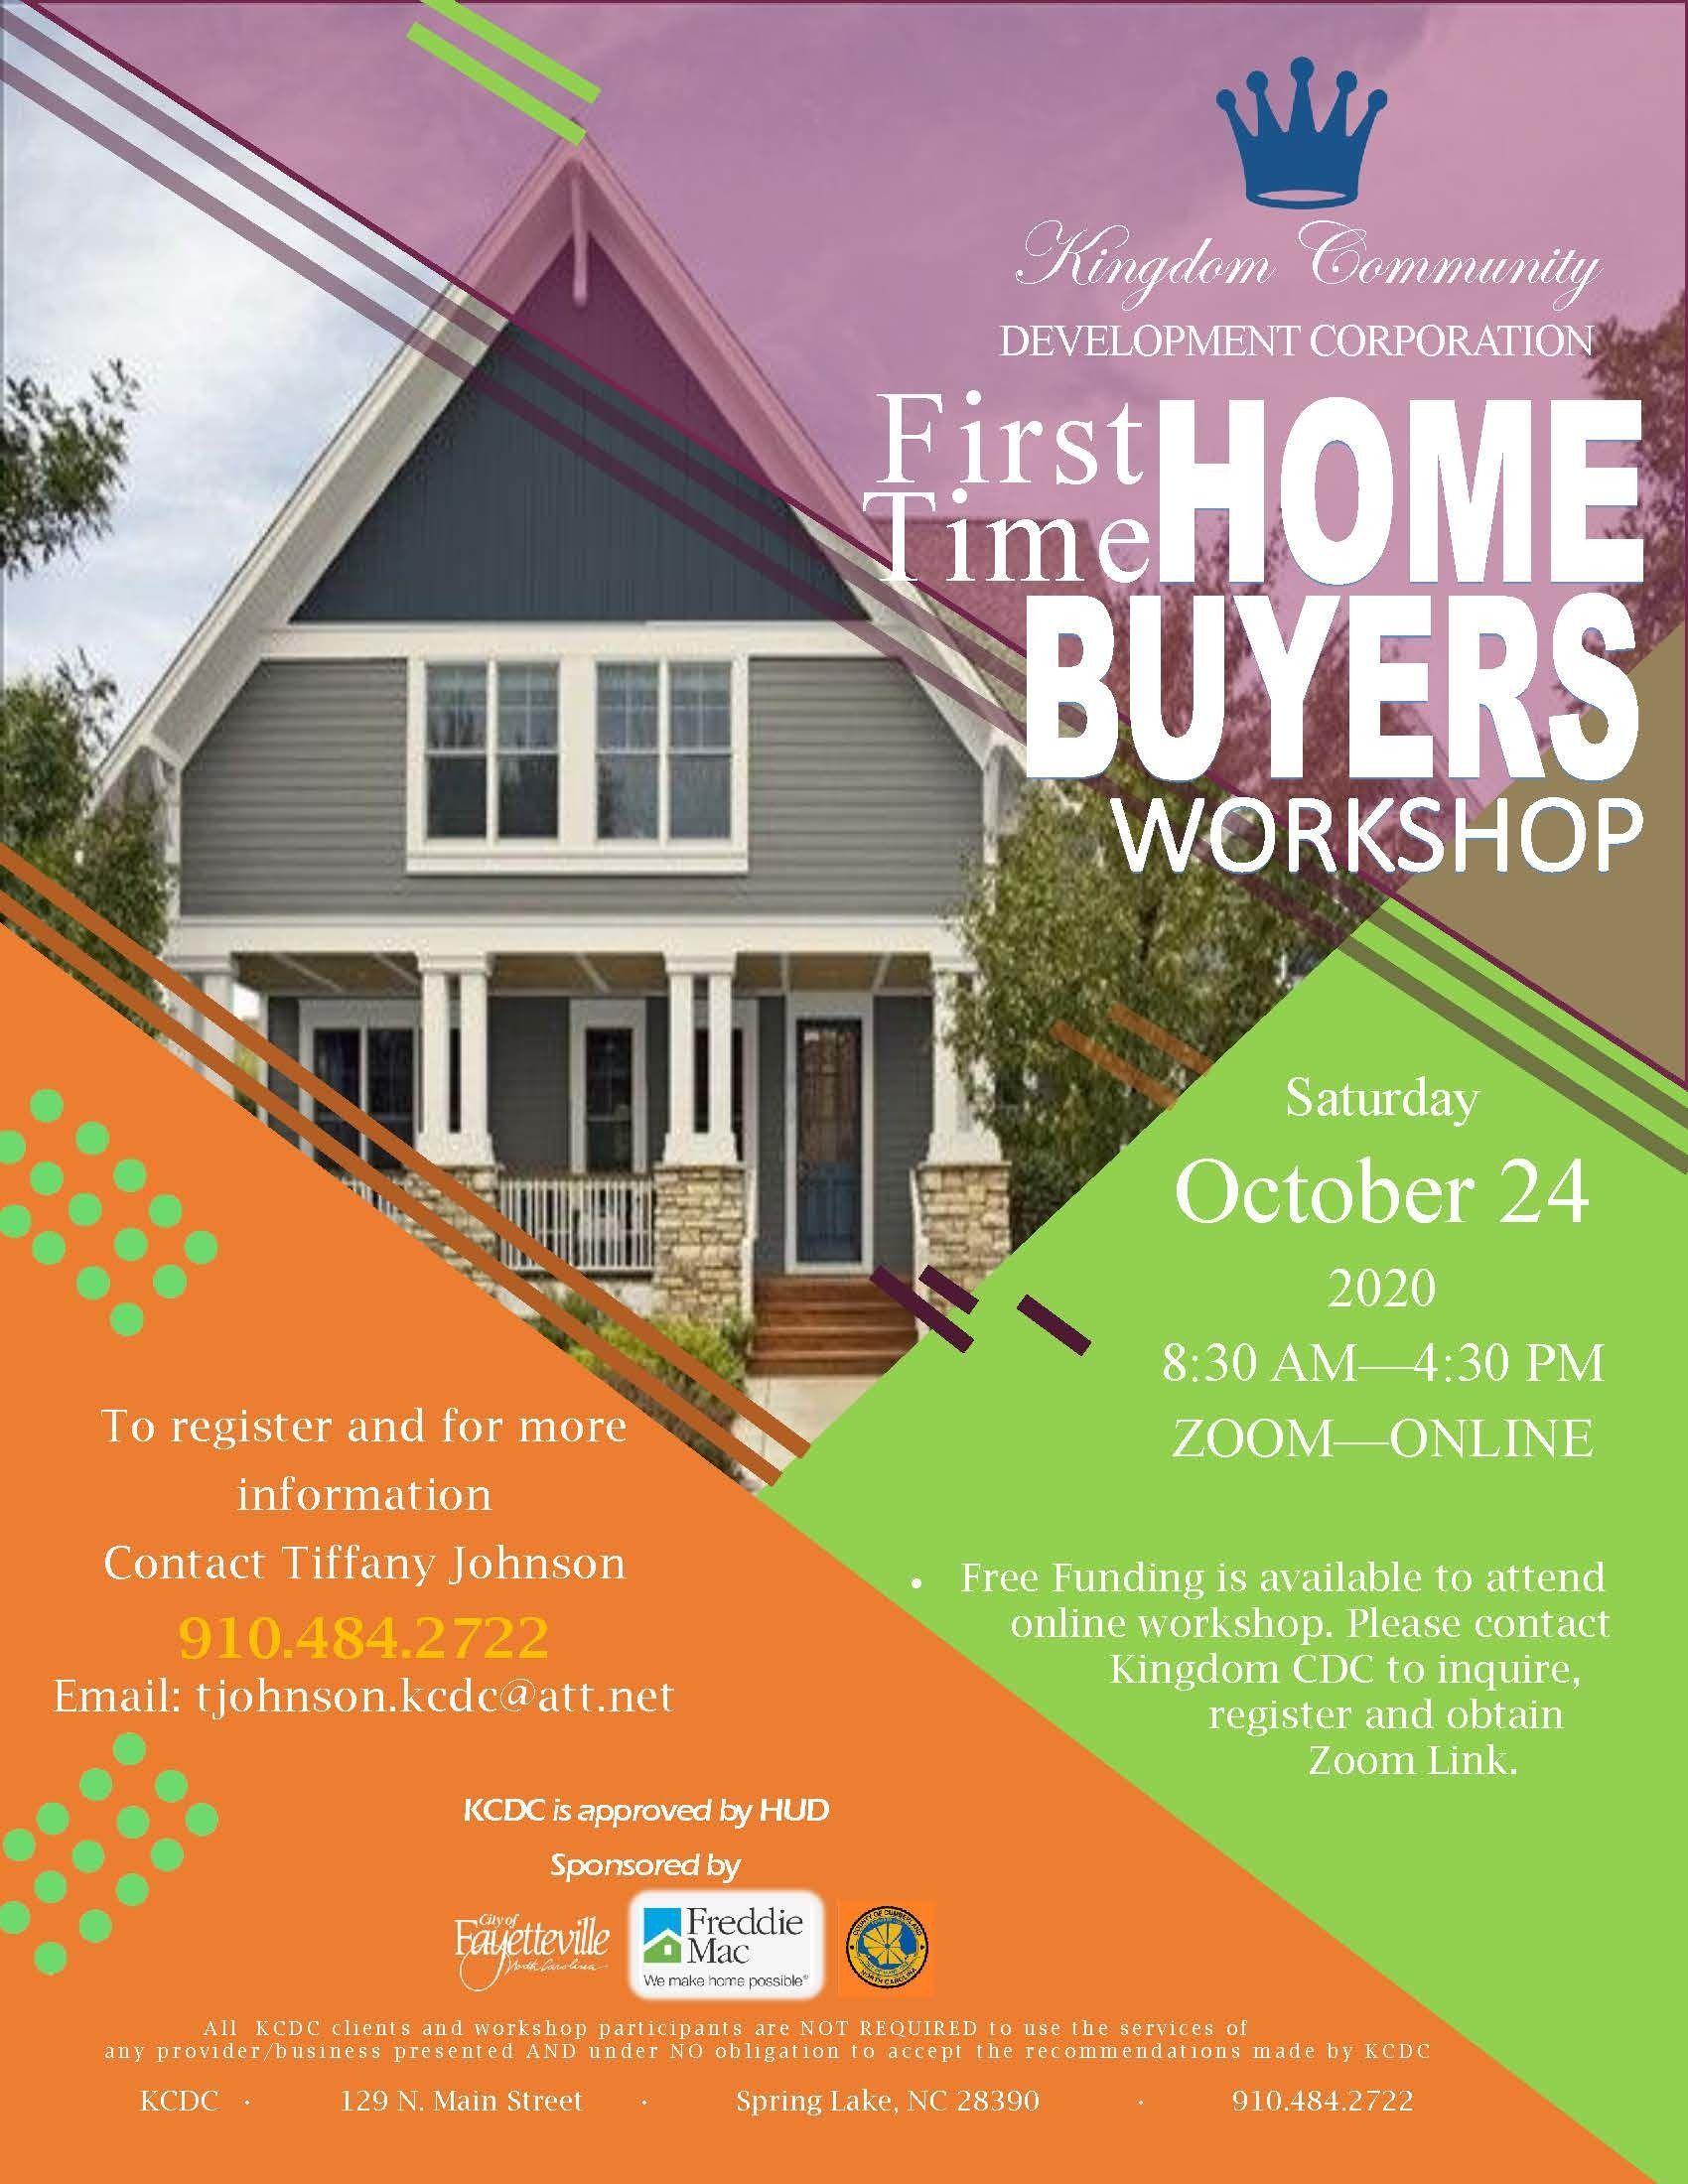 Kingdom Community Development Corporation First Time Home Buyers Workshop